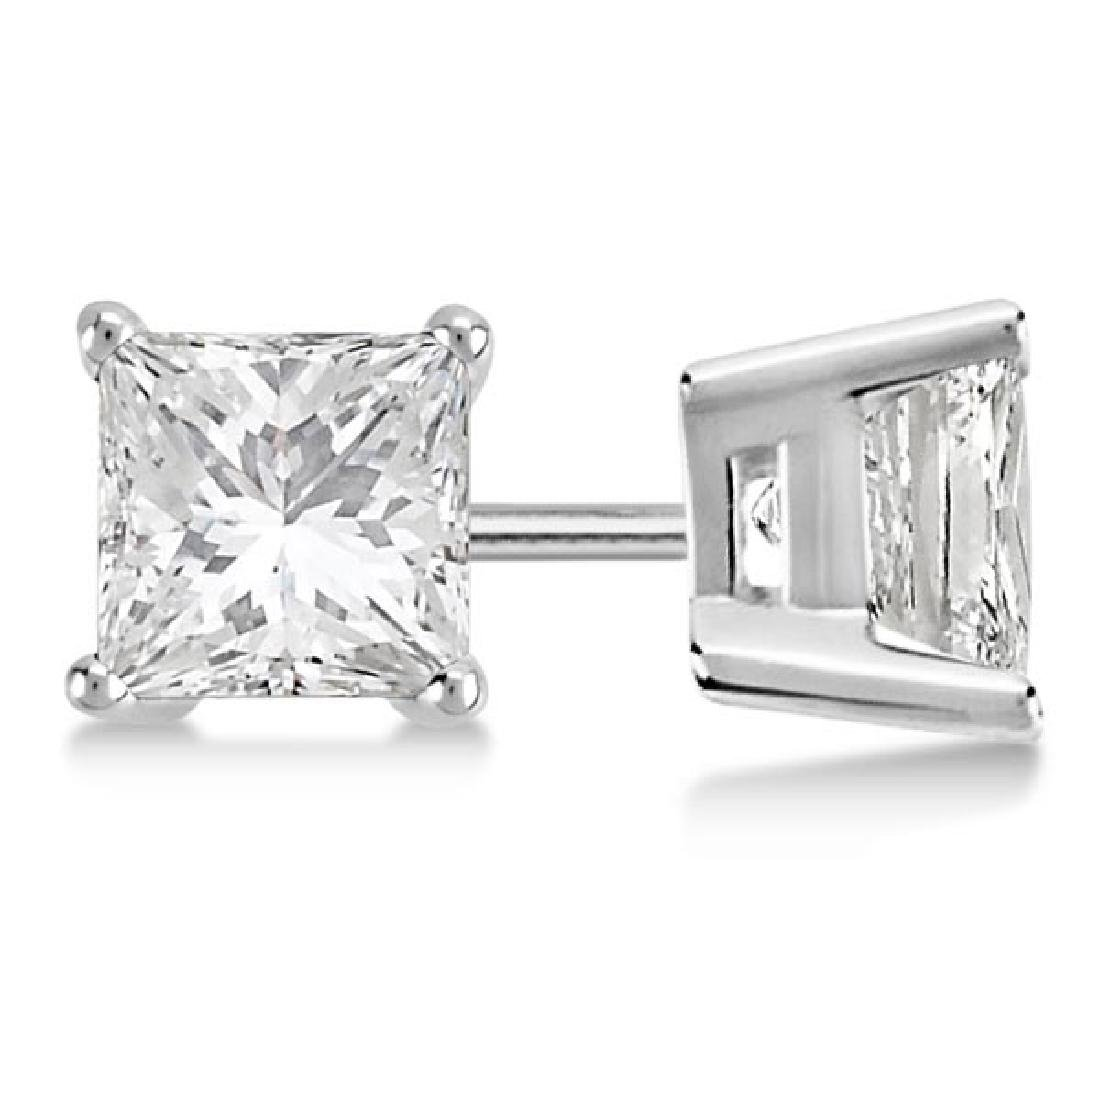 Certified 1 CTW Princess Diamond Stud Earrings D/I1